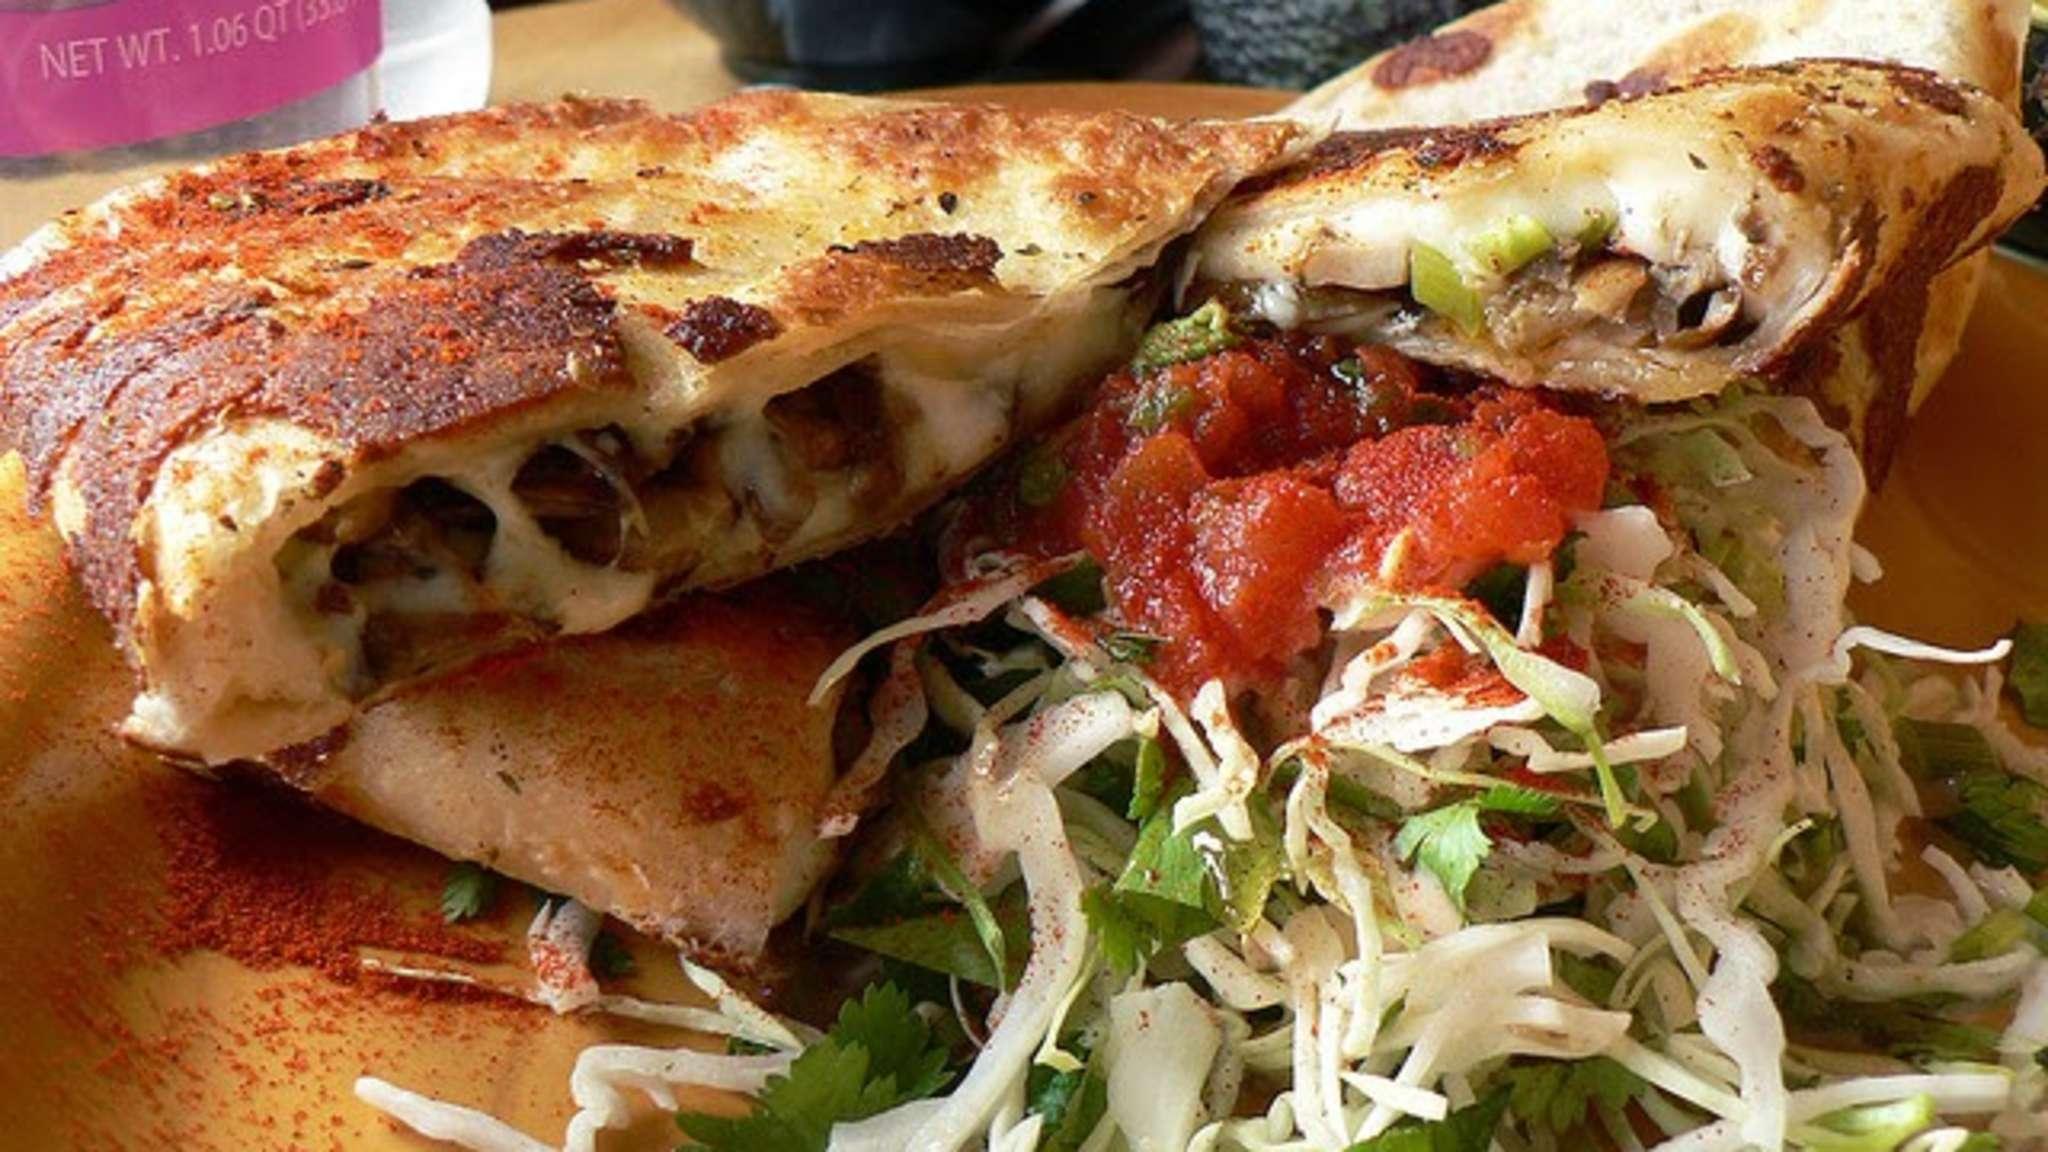 Quesadillas au poulet, mozzarella, avocat, salsa tomates (Mexique)